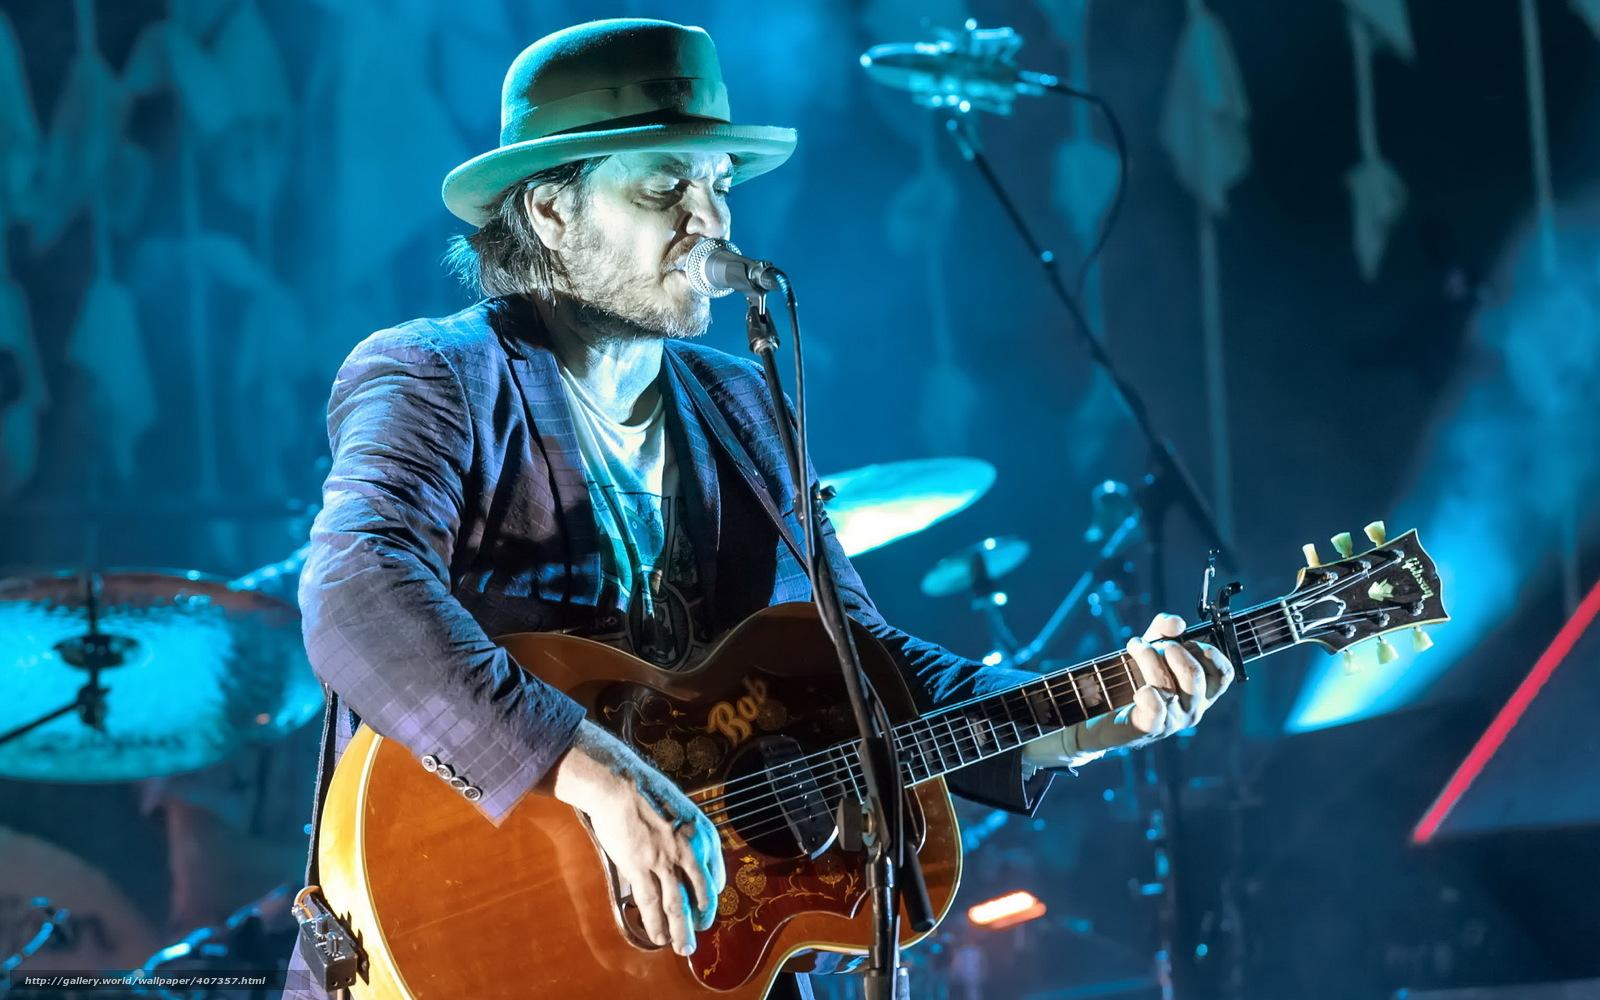 Tlcharger fond decran musique guitare musicien concert fonds d